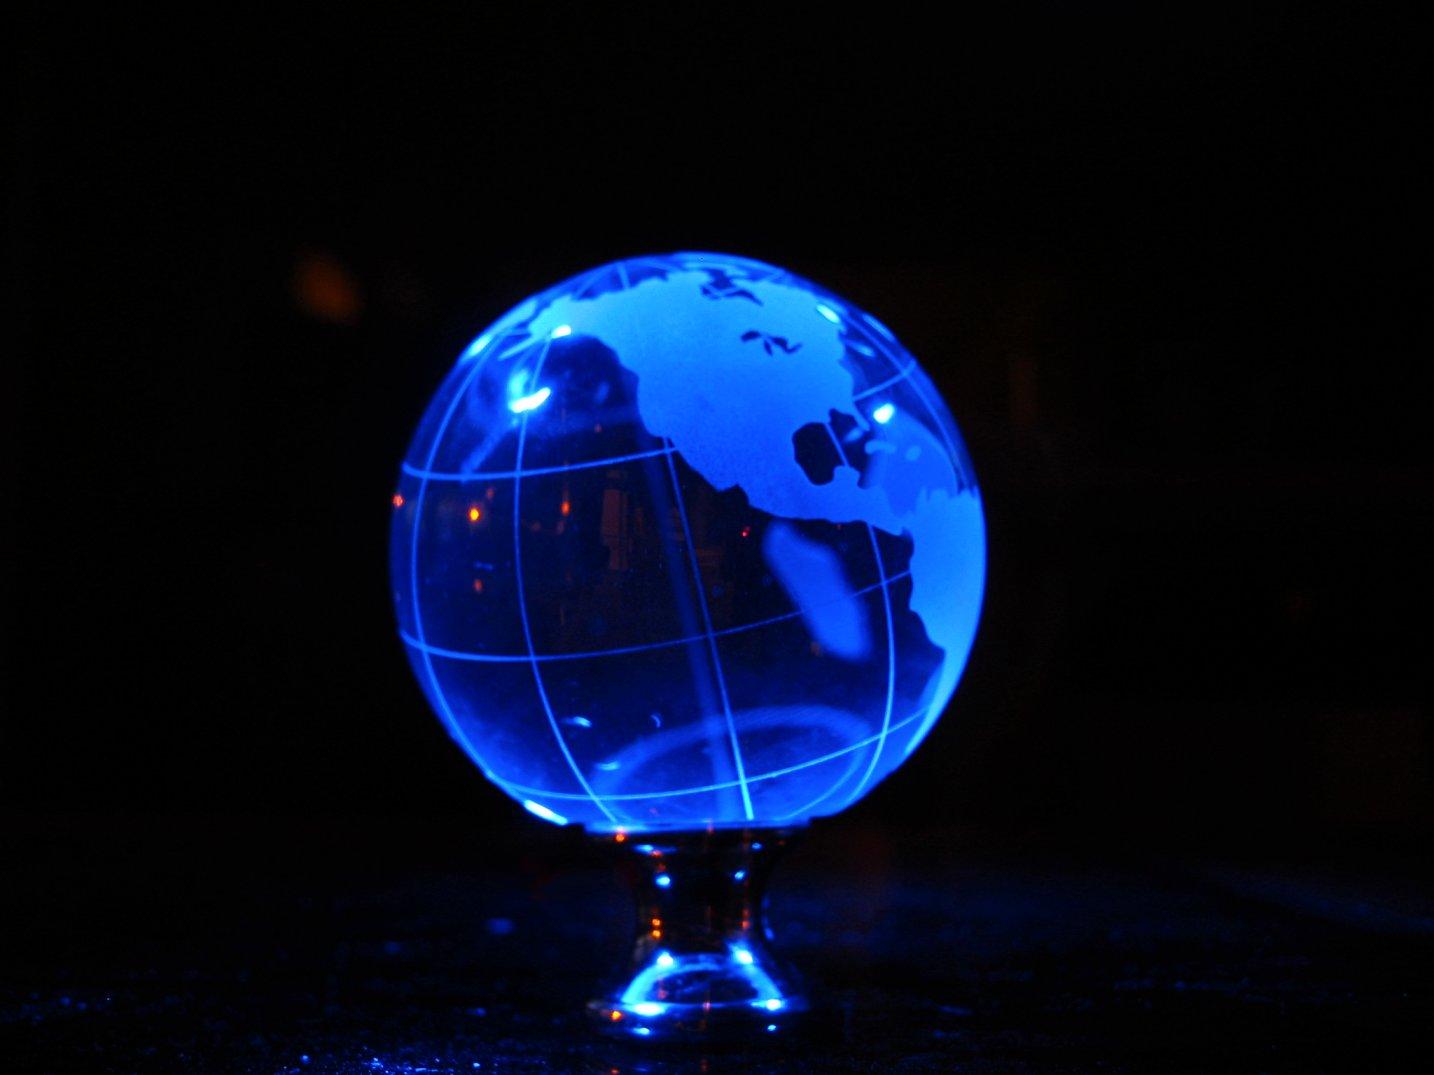 Soul Amp: Strange Glass Earth Globe LED Photo Art